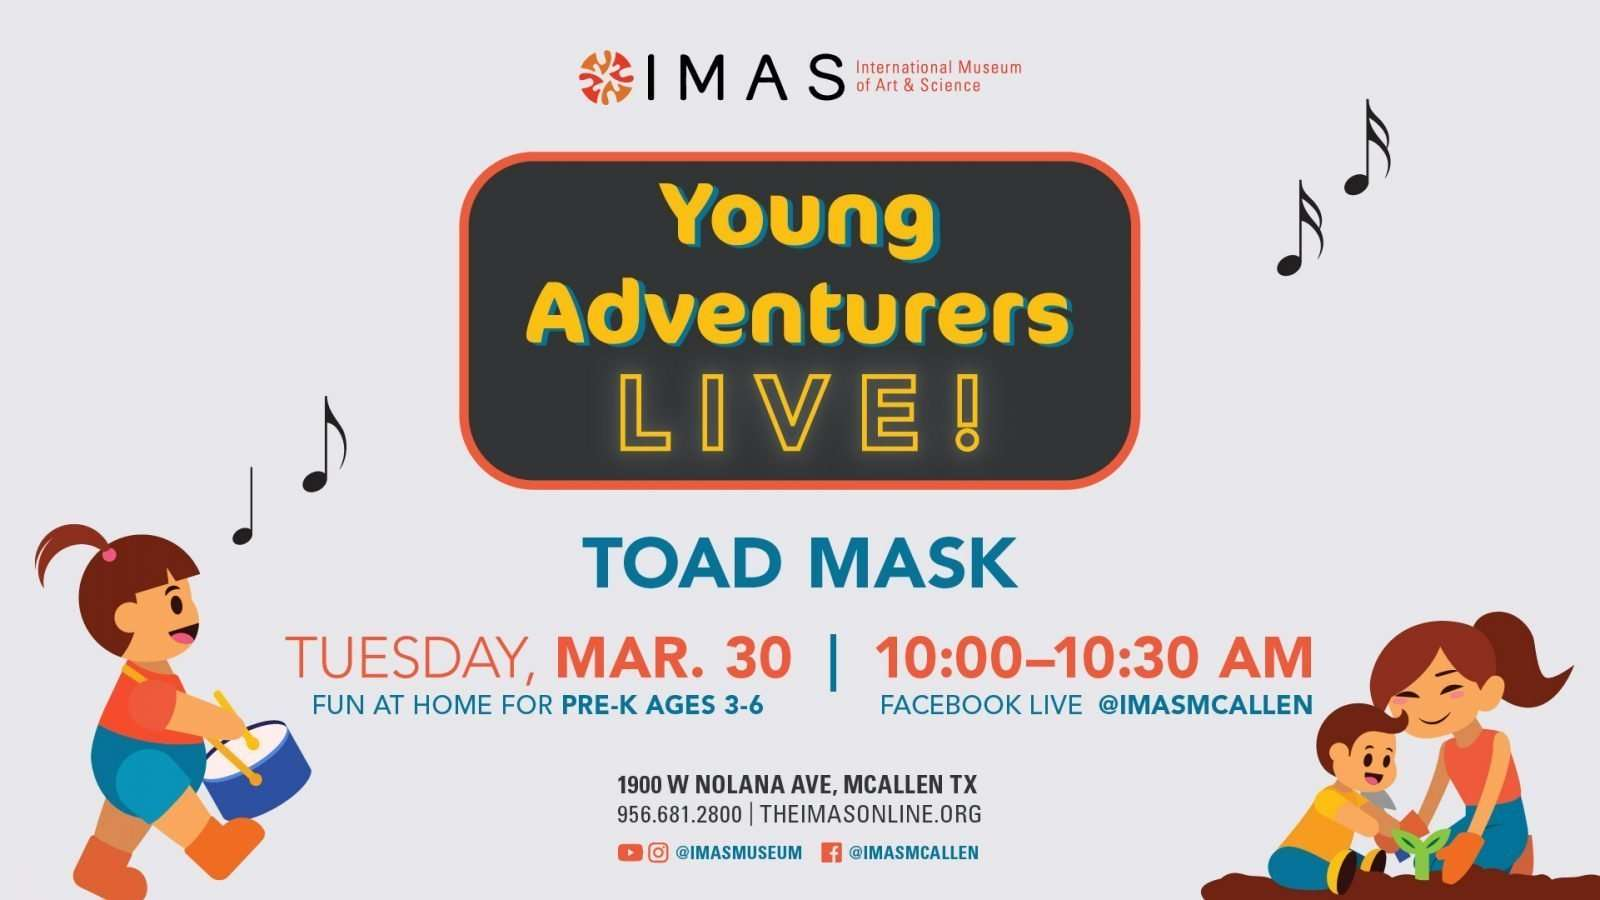 3 30 21 YoungAdventurers fb event 1